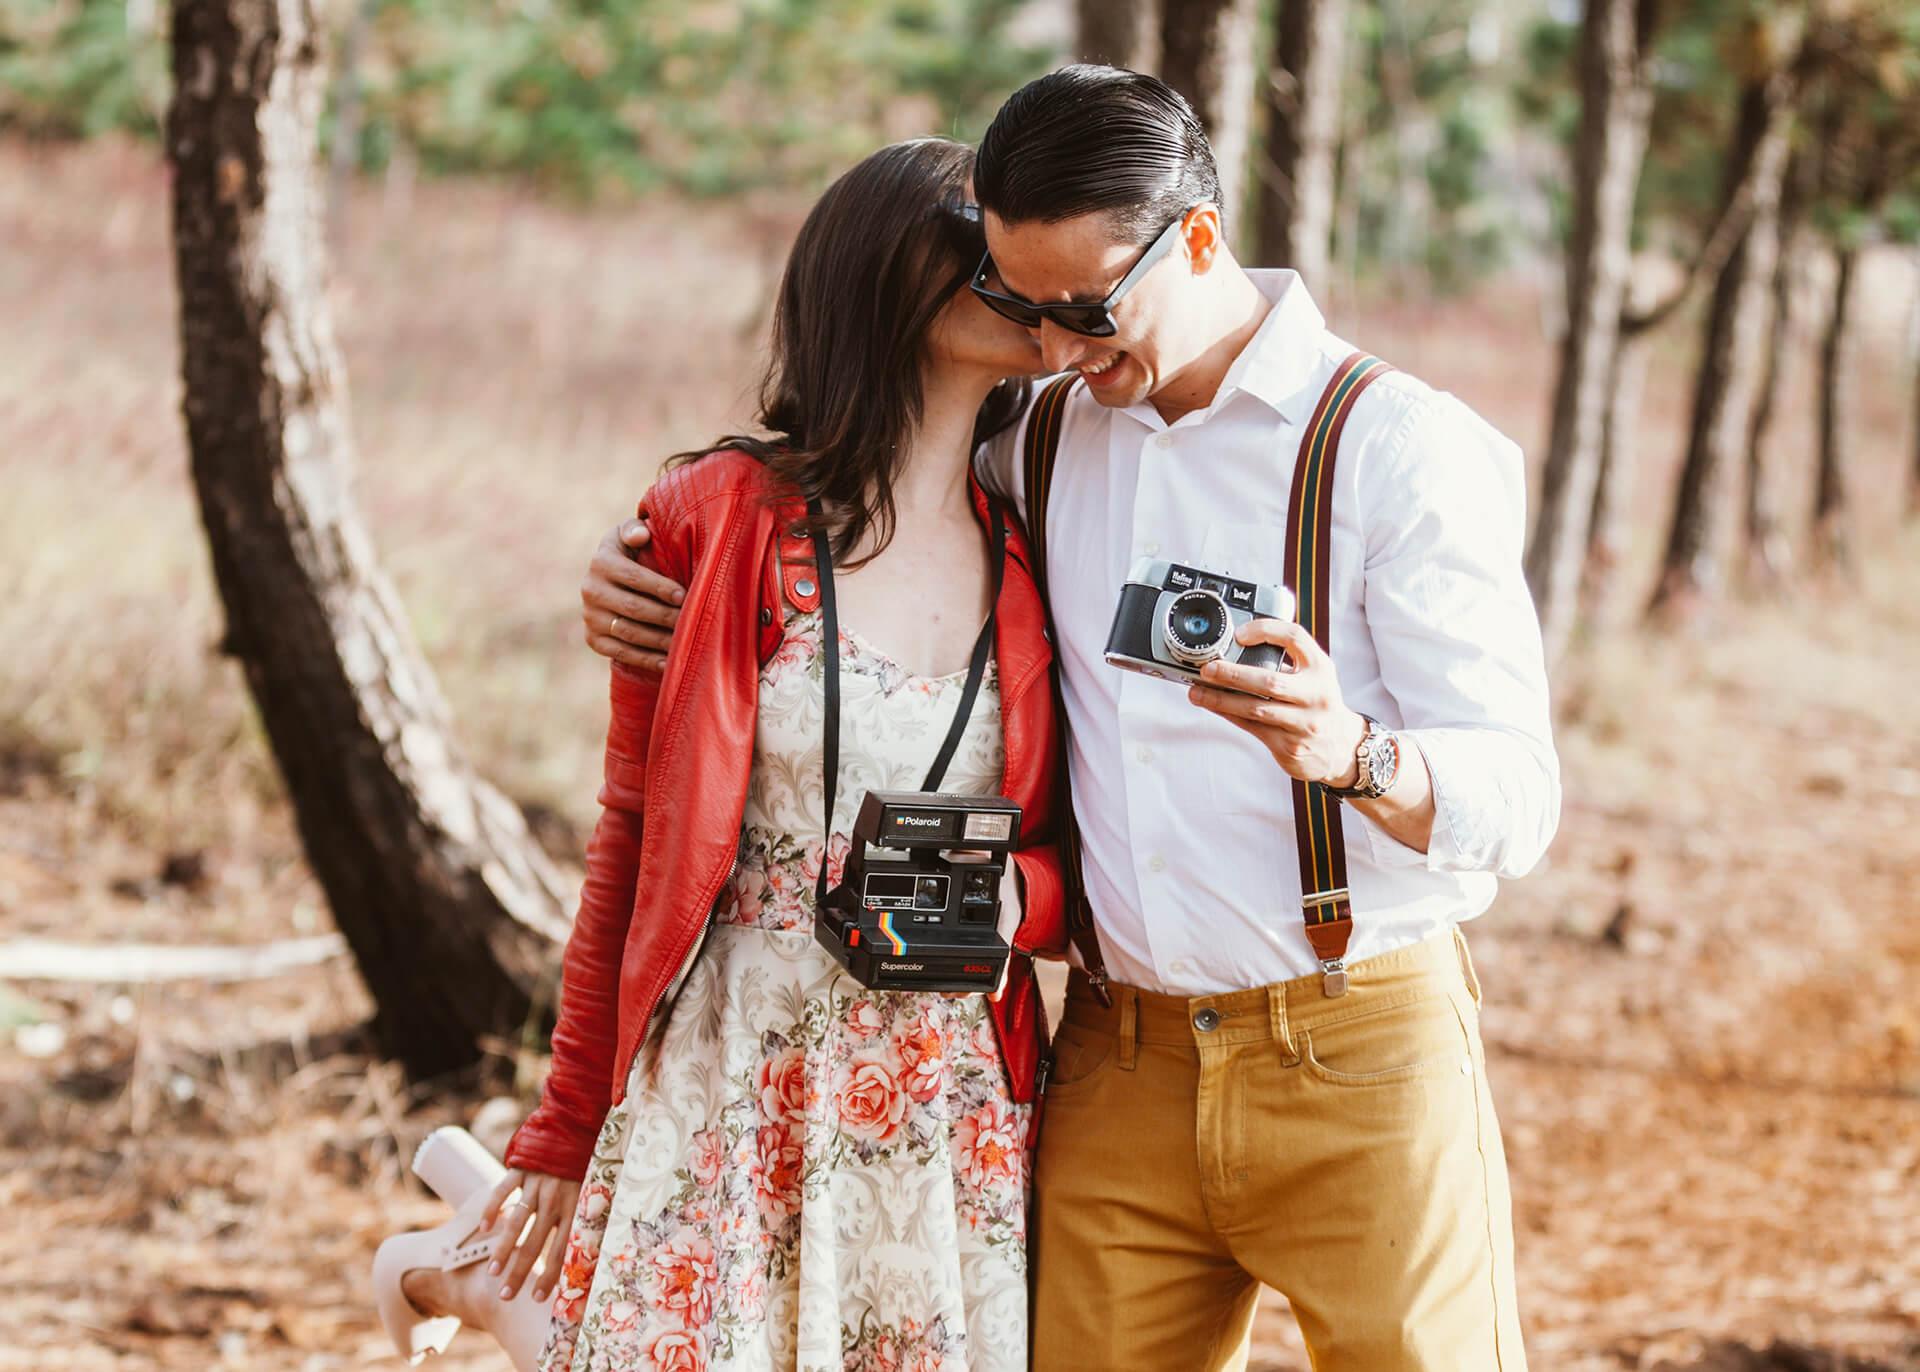 romantic picnic date ideas for activities